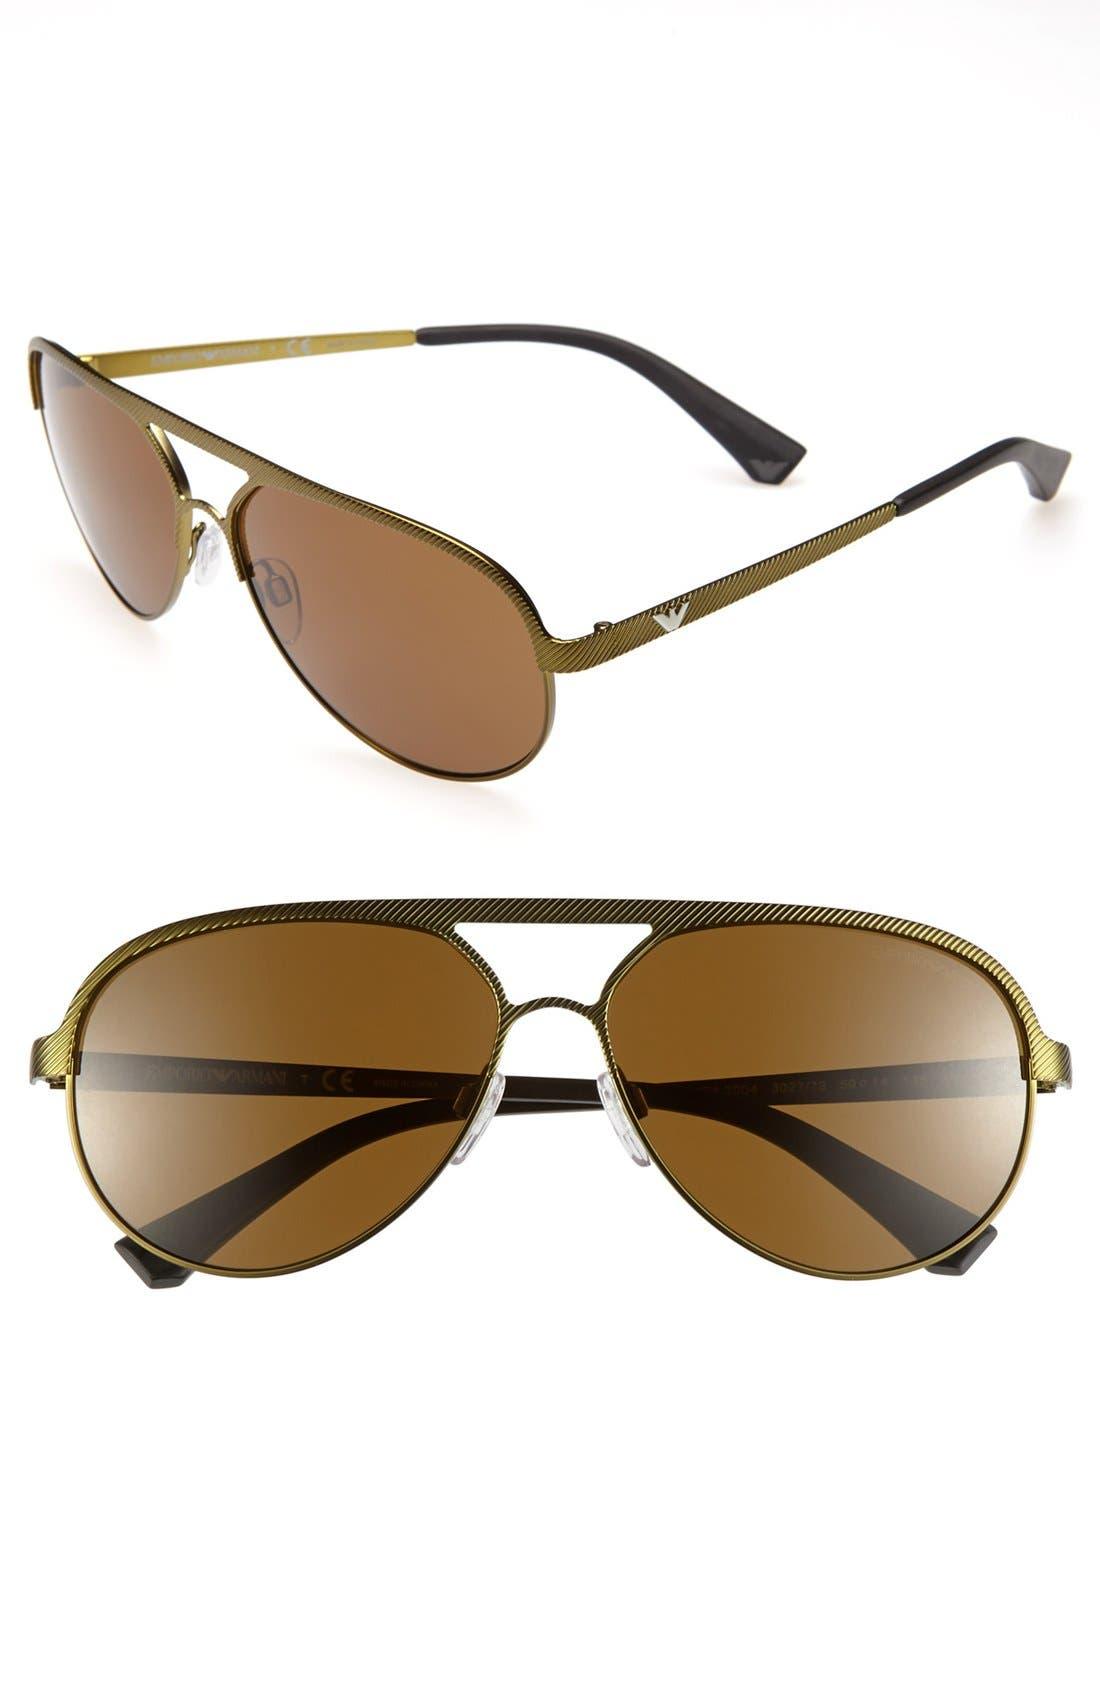 Alternate Image 1 Selected - Emporio Armani 59mm Aviator Sunglasses